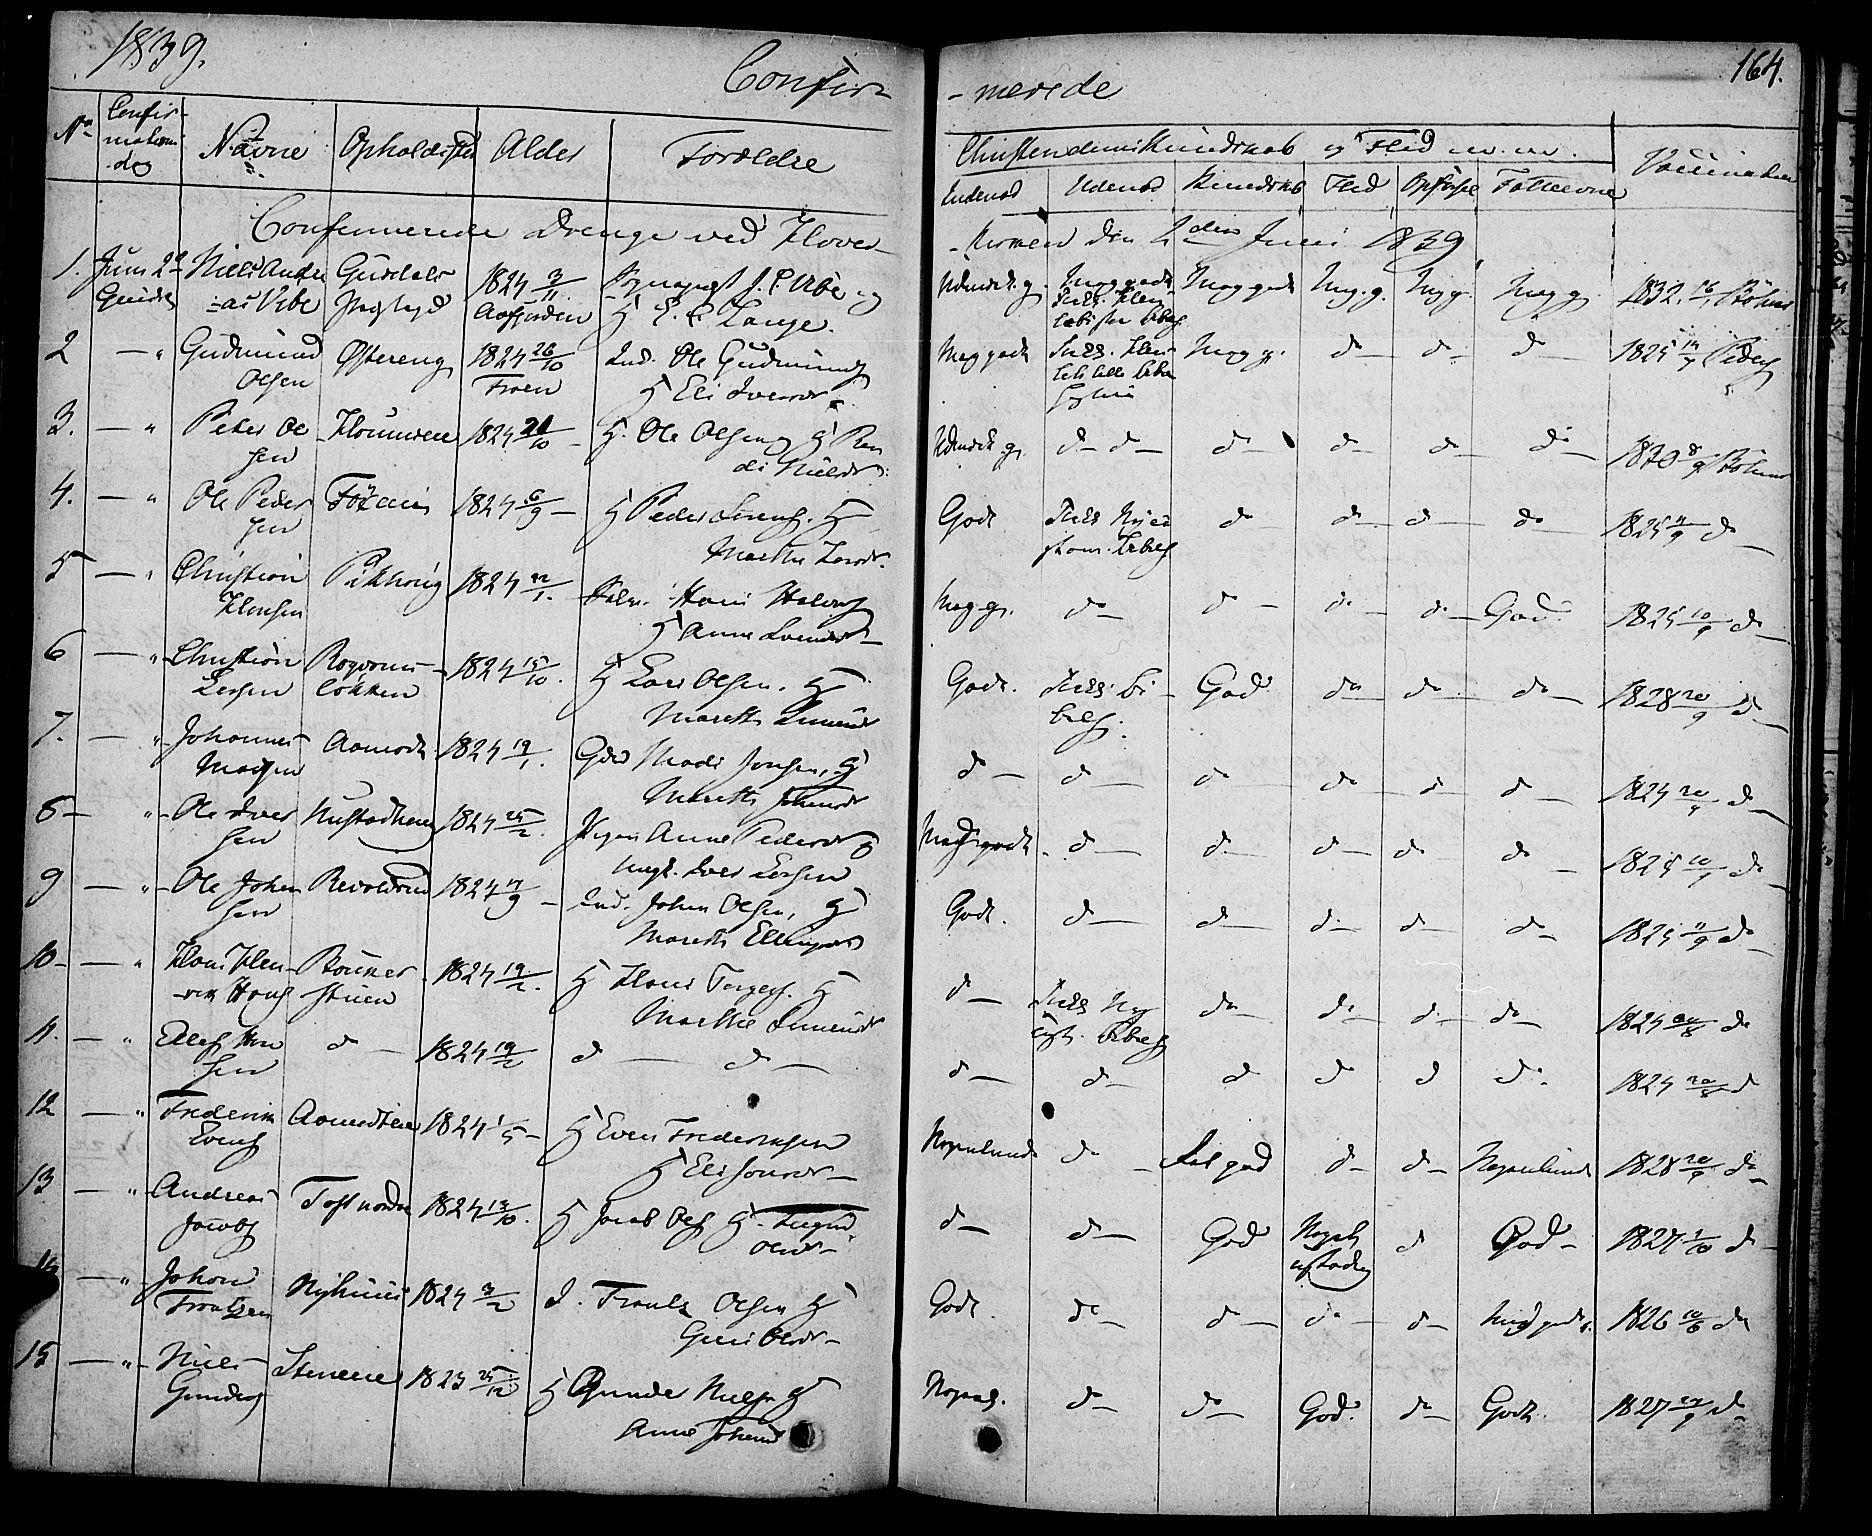 SAH, Gausdal prestekontor, Ministerialbok nr. 6, 1830-1839, s. 164